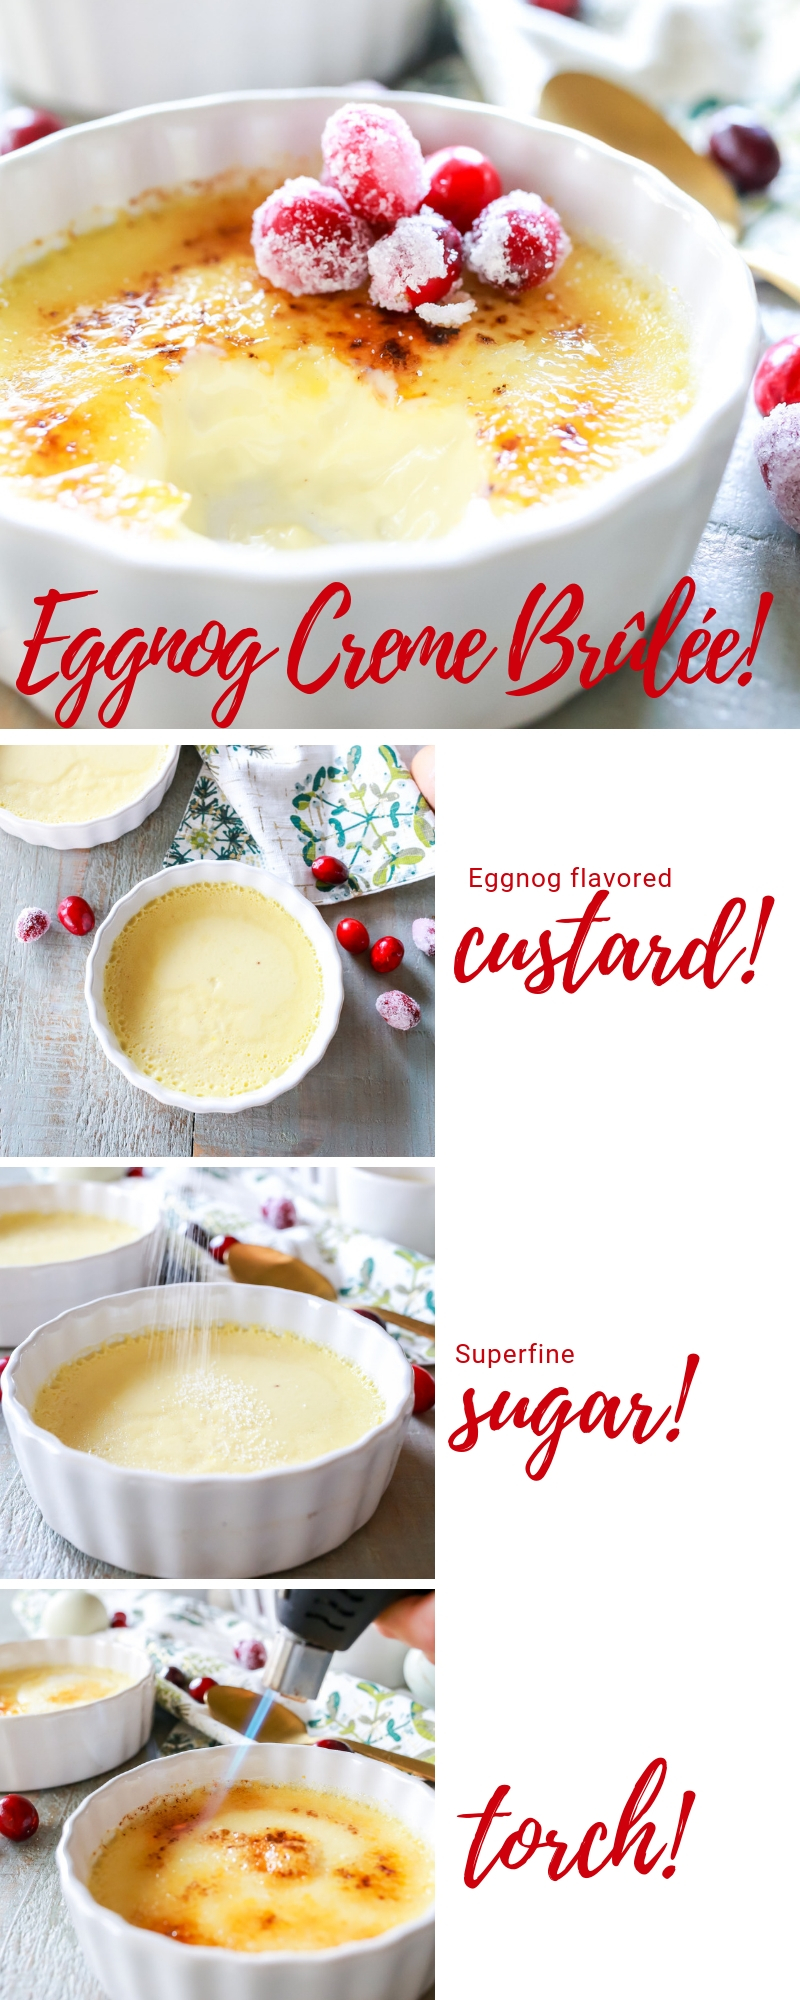 fool proof eggnog creme brûlée recipe that tastes like Christmas!